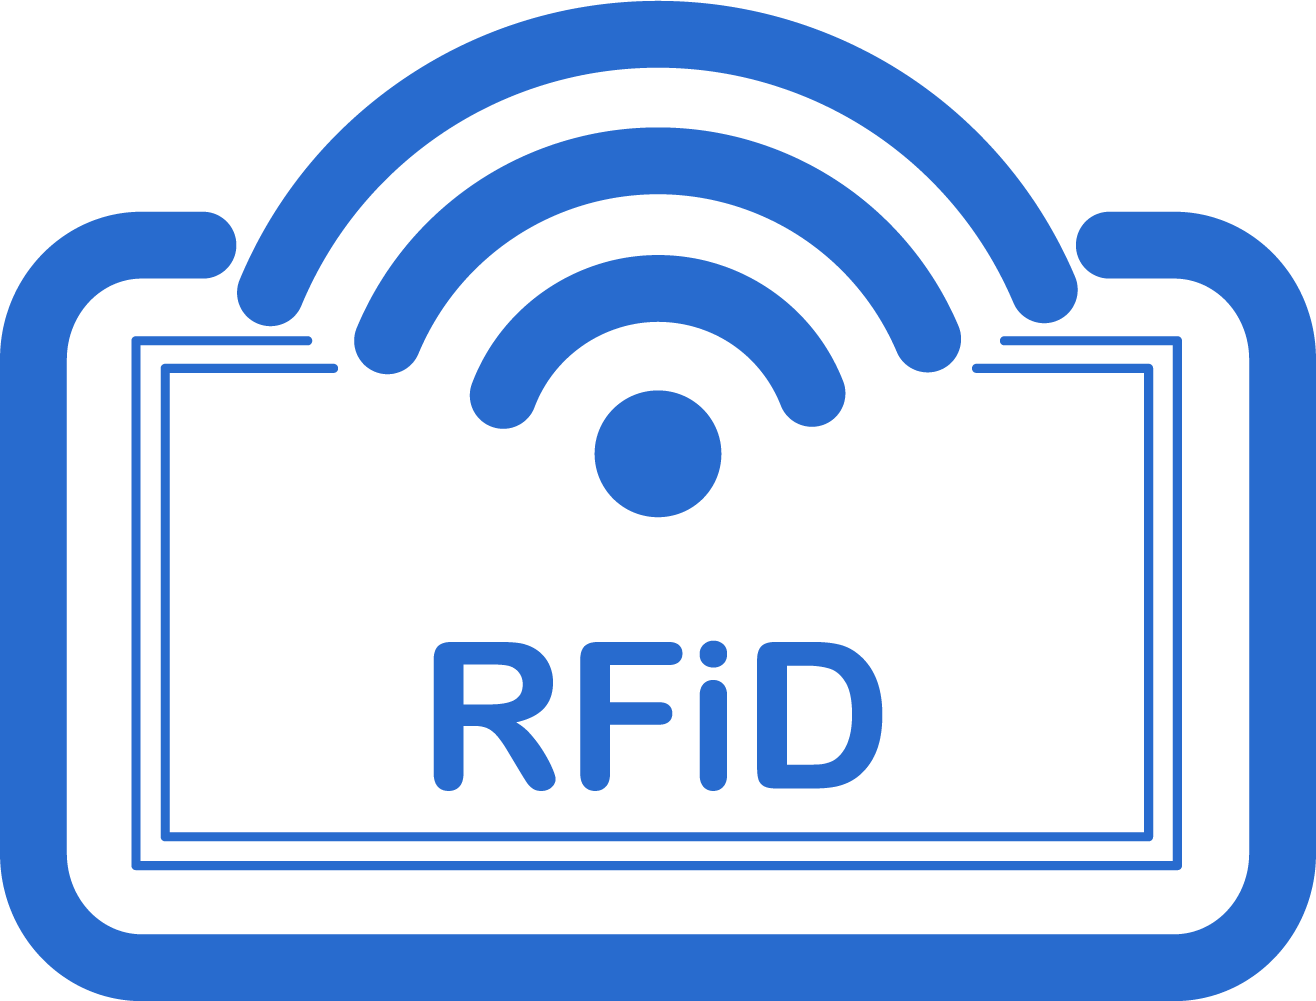 RFID技术是如何让传统制造业转型、改造和升级的